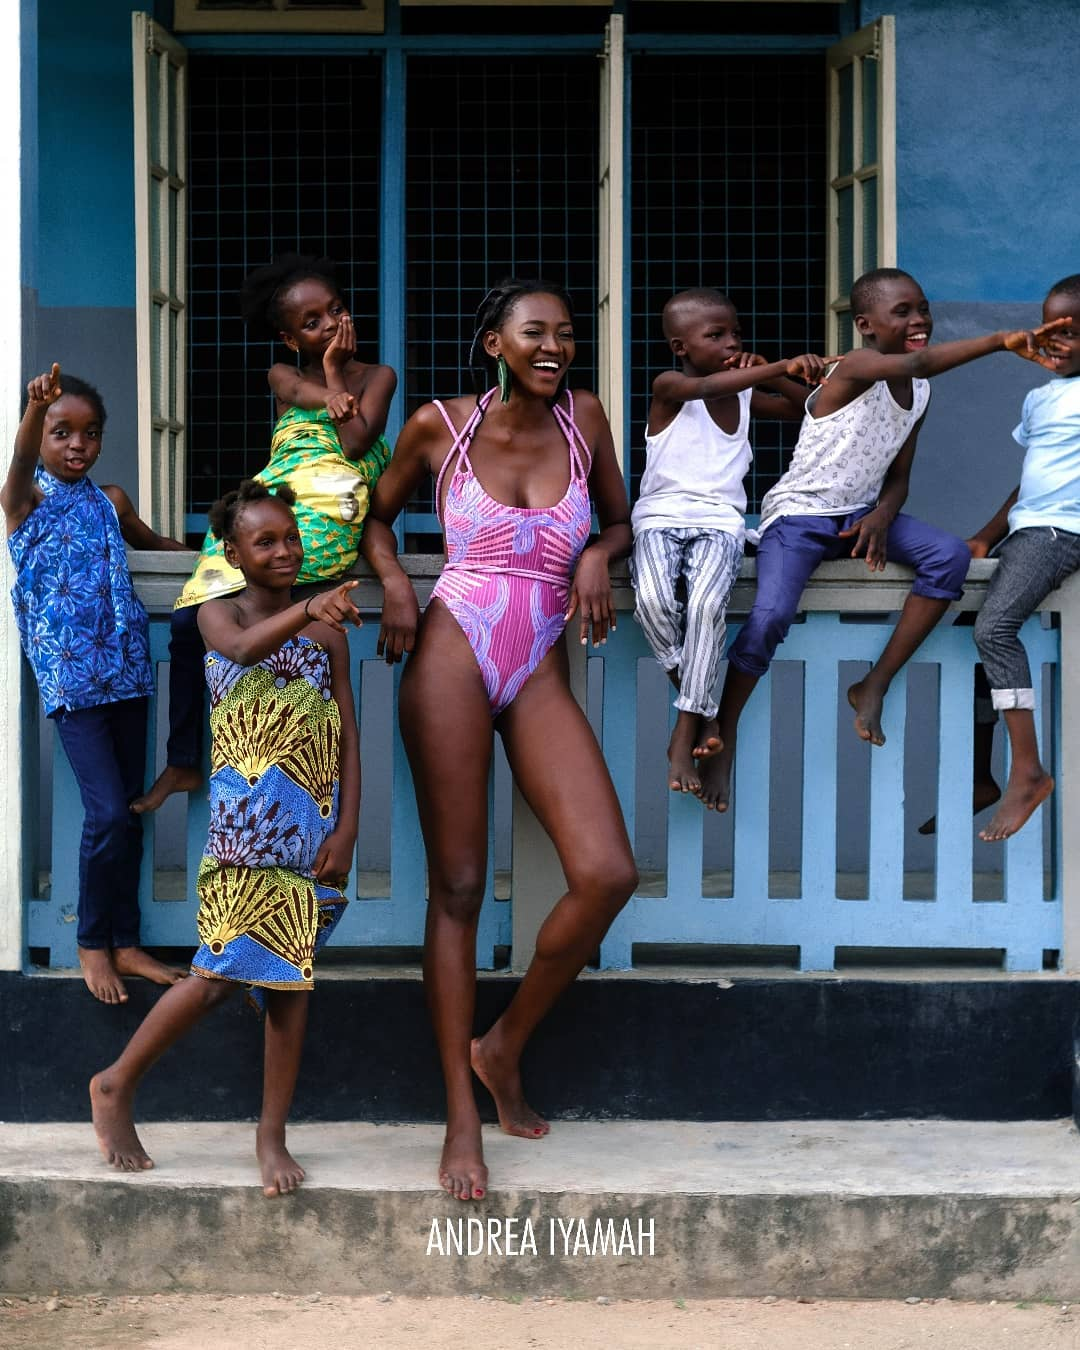 ICYMI: This Andrea Iyamah Swimwear x Oluchi CampaignWill Make You Feel Nostalgic For Sure!